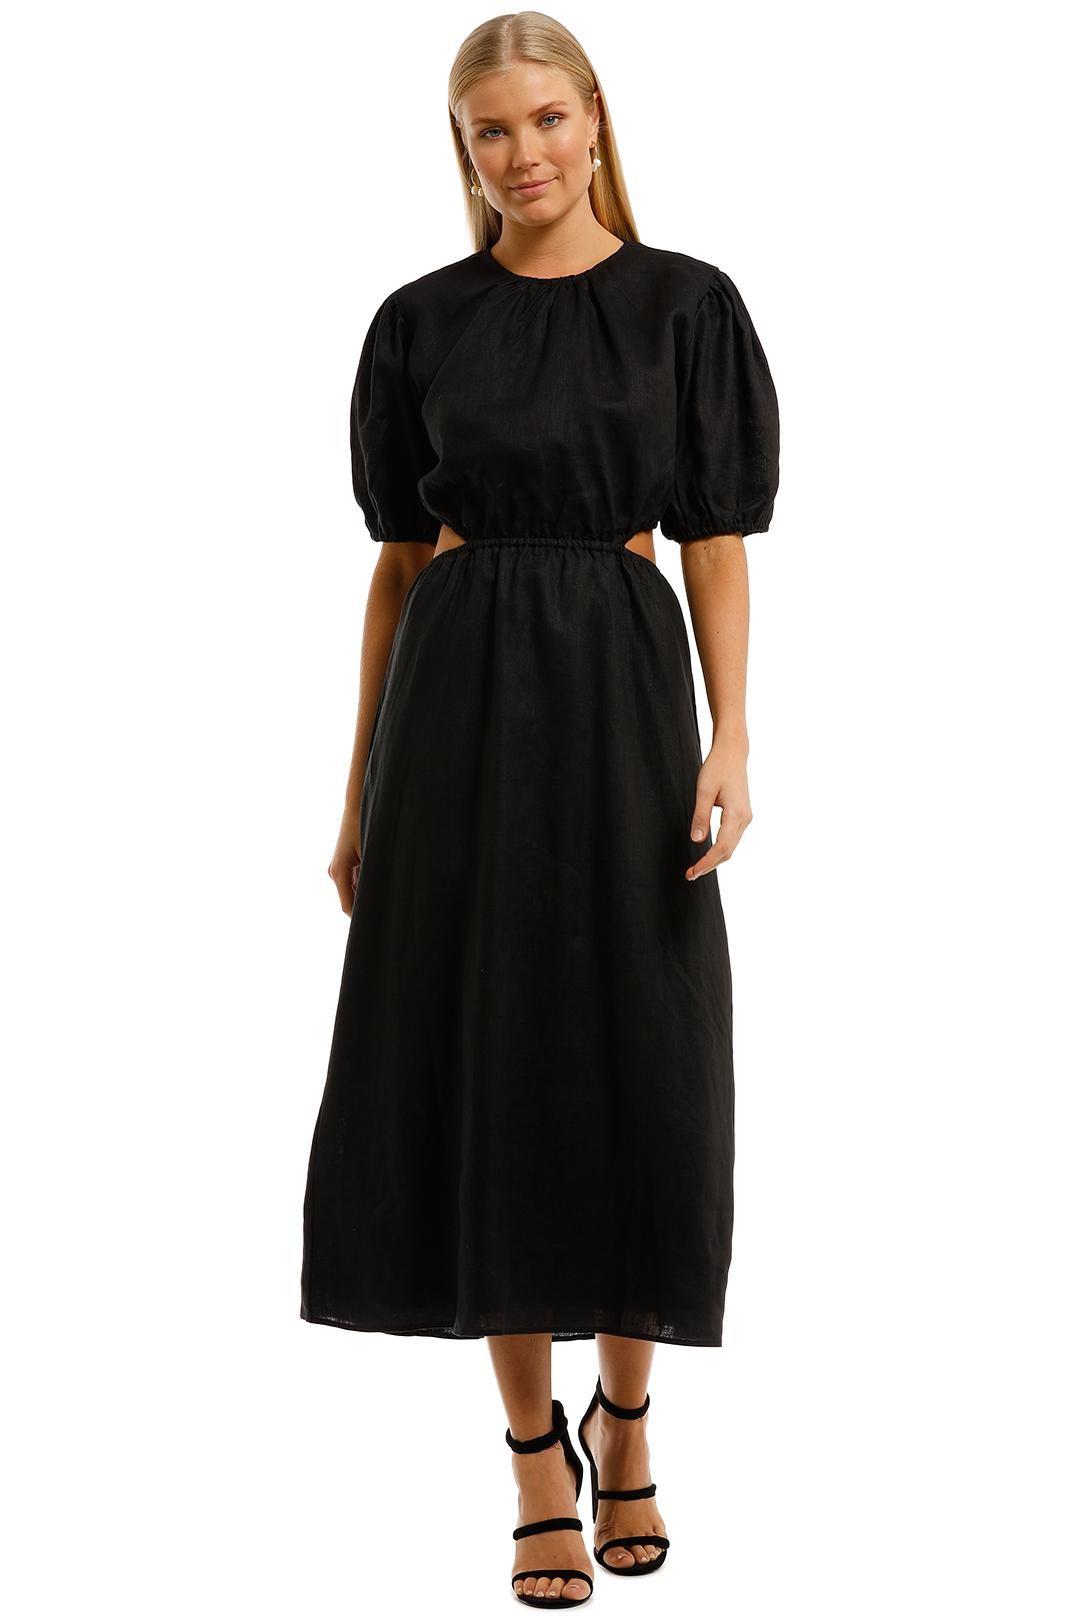 AERE Cut Out Maxi Dress Black Linen